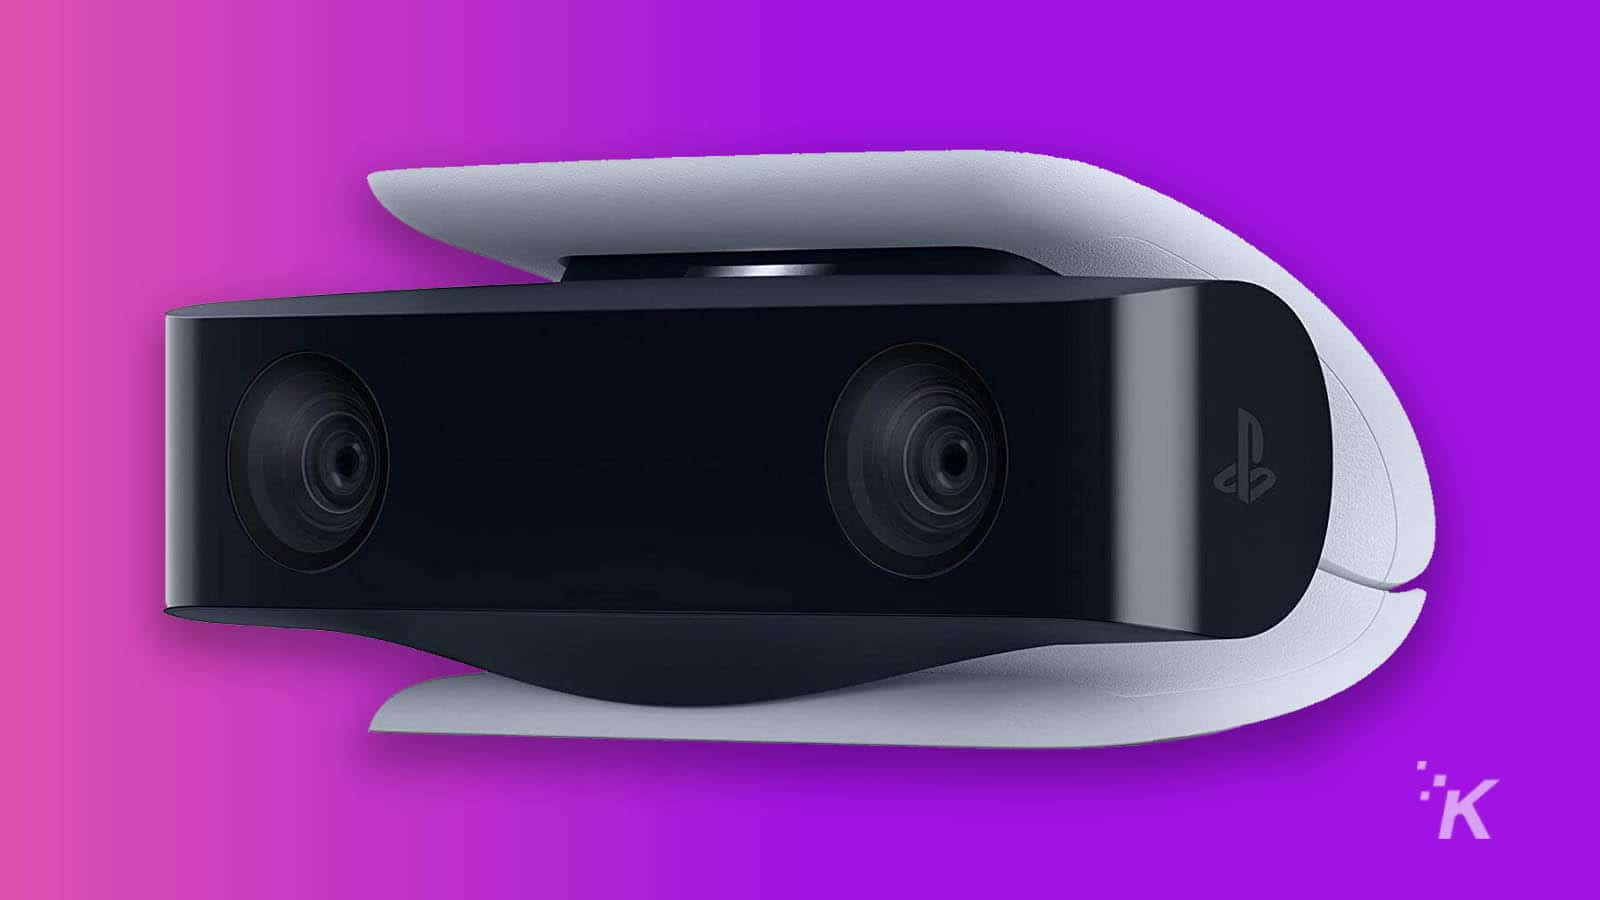 sony playstation 5 hd camera on purple background